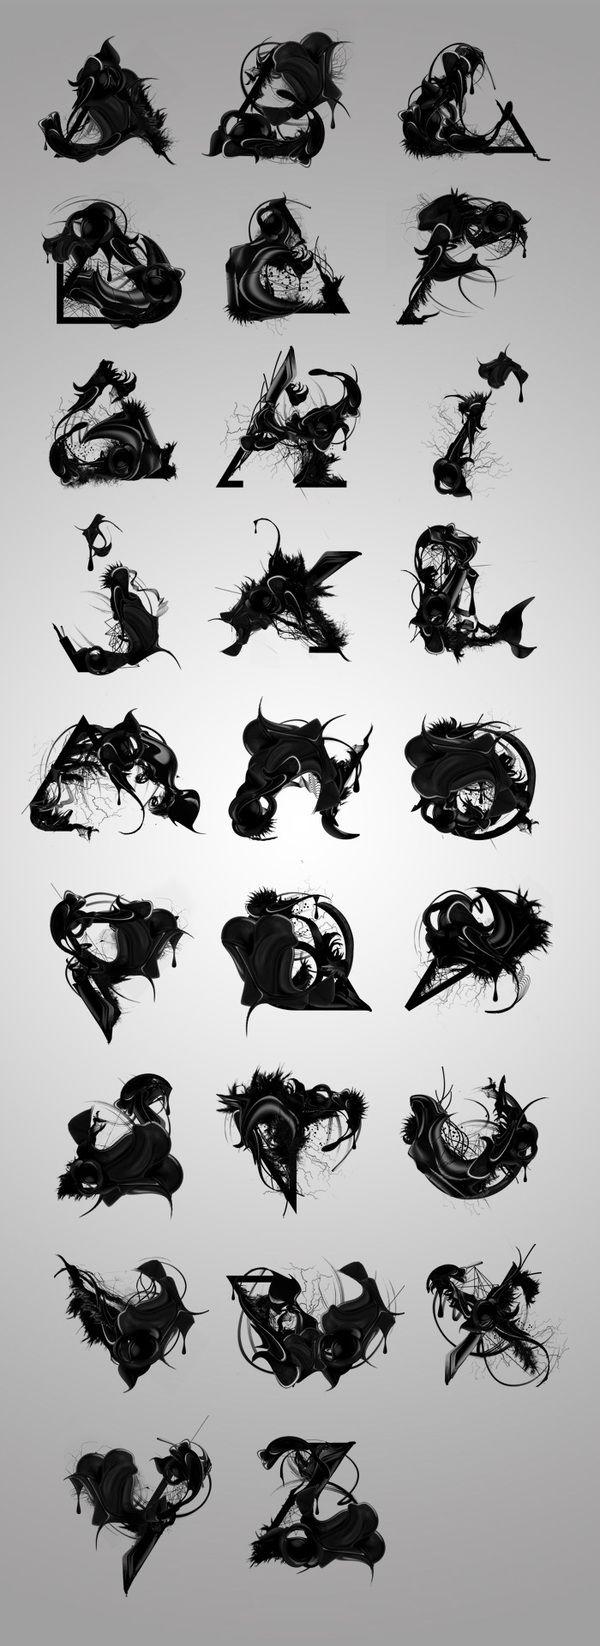 Trisec experimental typefaces - Organic (http://www.behance.net/gallery/TRISEC-FONTS-COLLAB/540221)